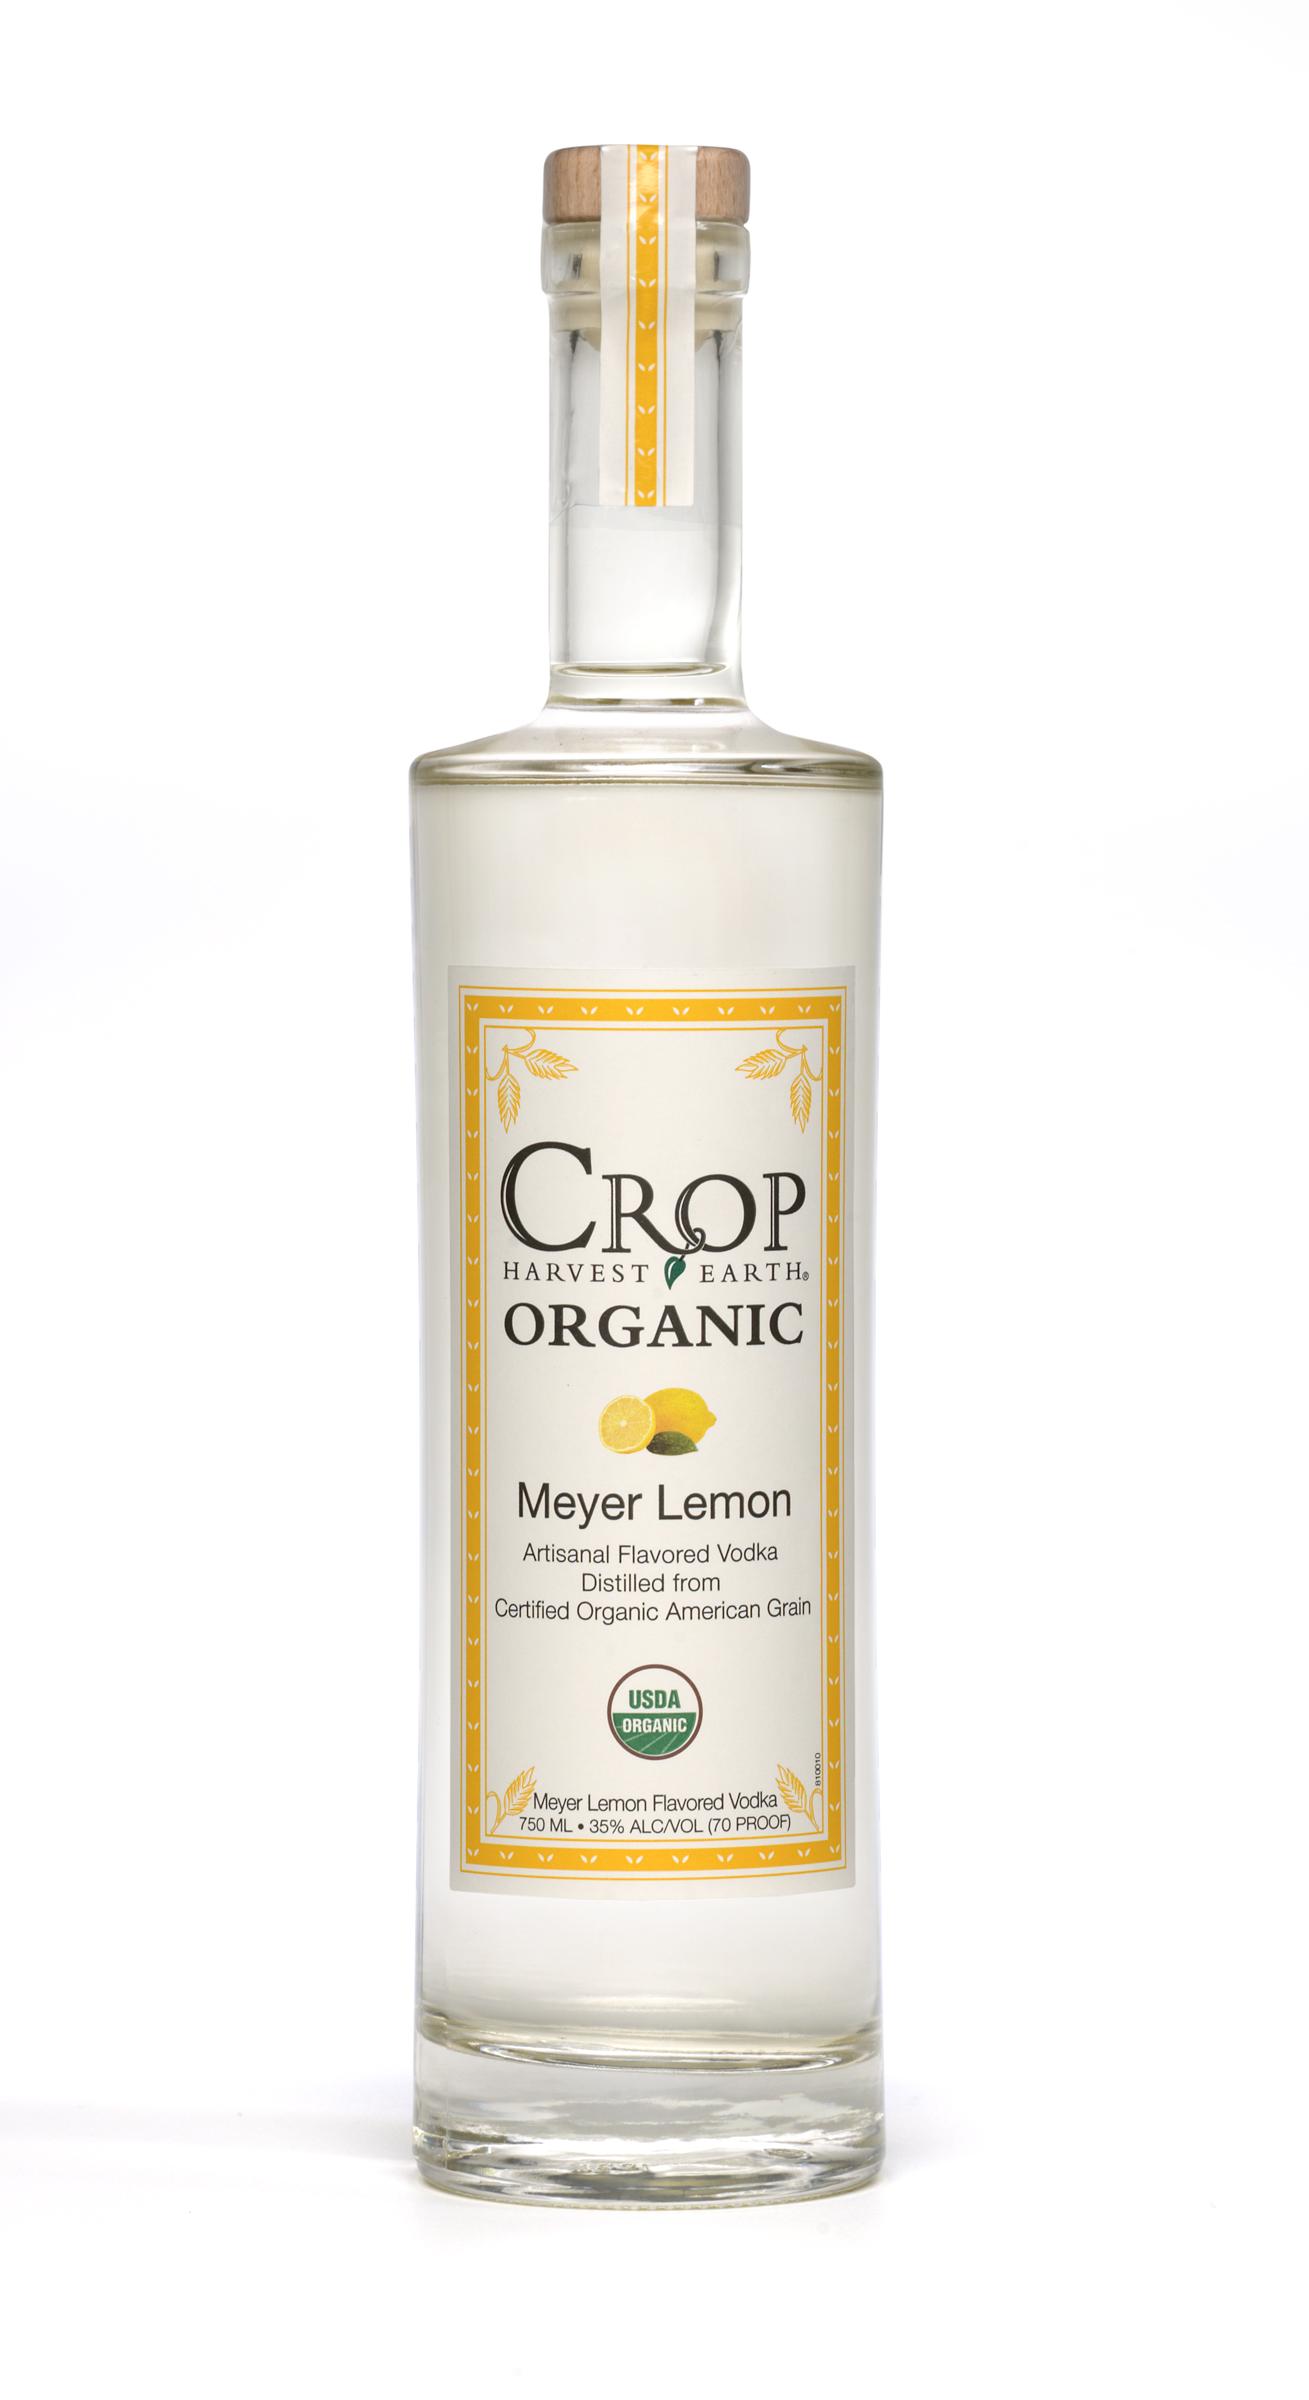 Crop Organic Meyer Lemon Vodka